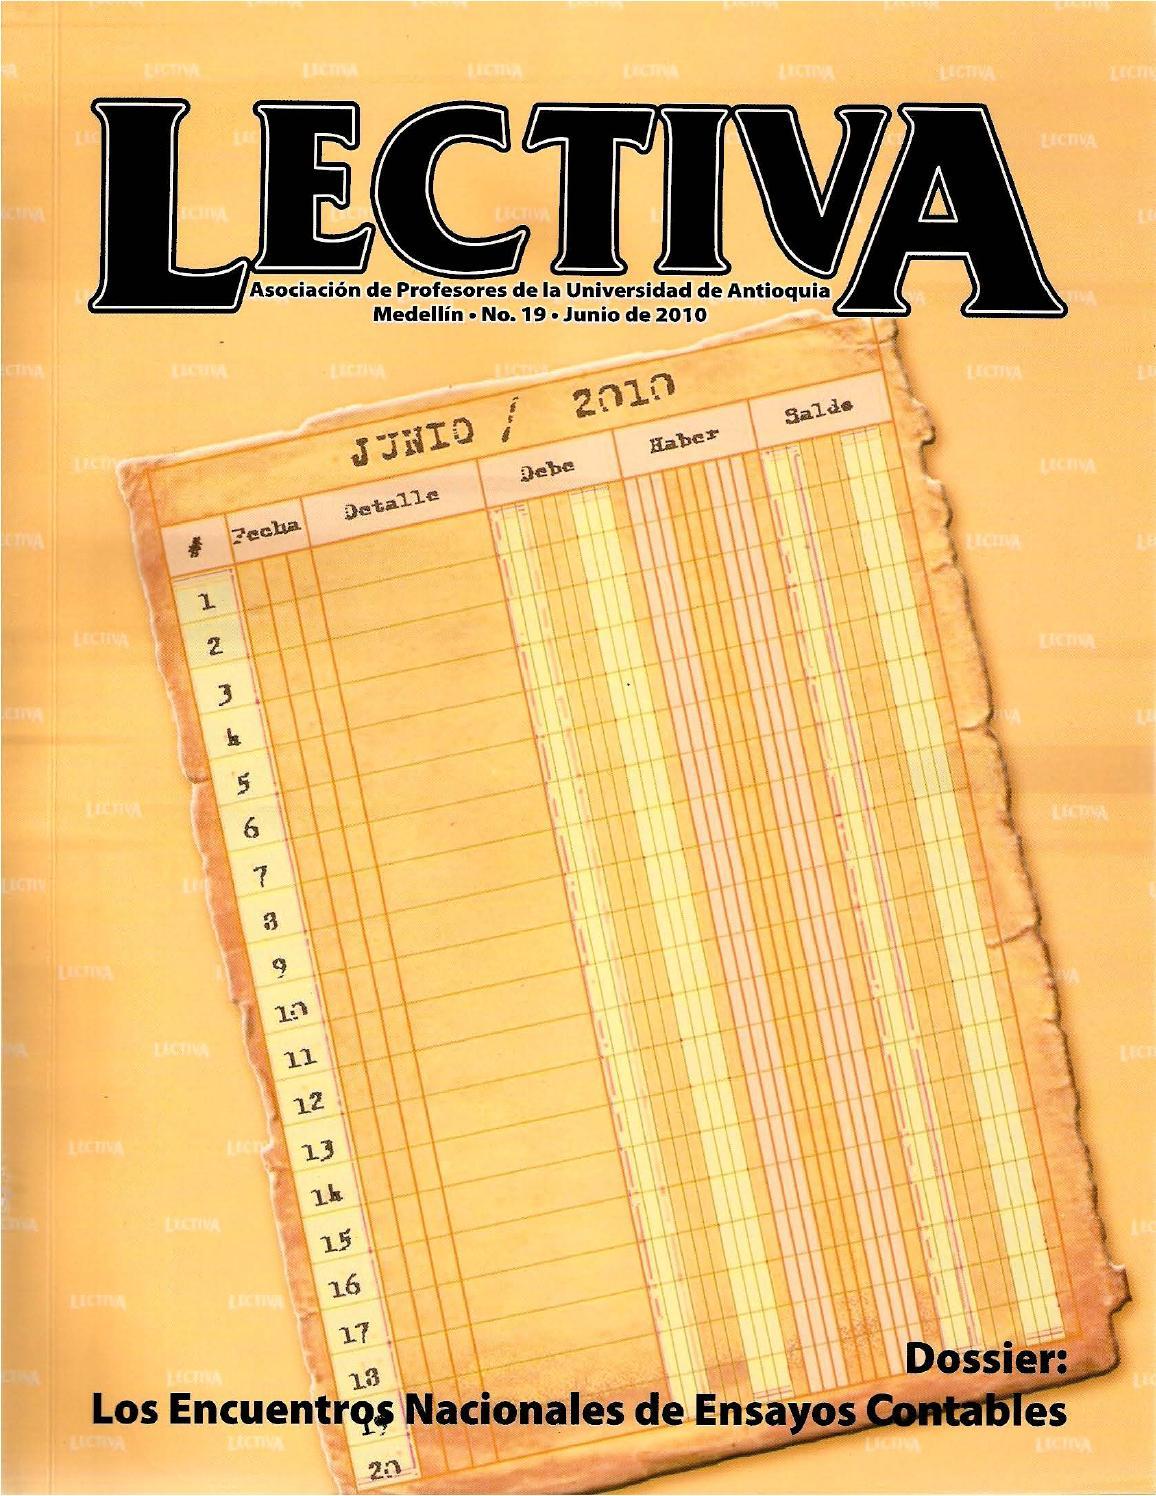 Revista Lectiva No. 19 by Asoprudea - issuu